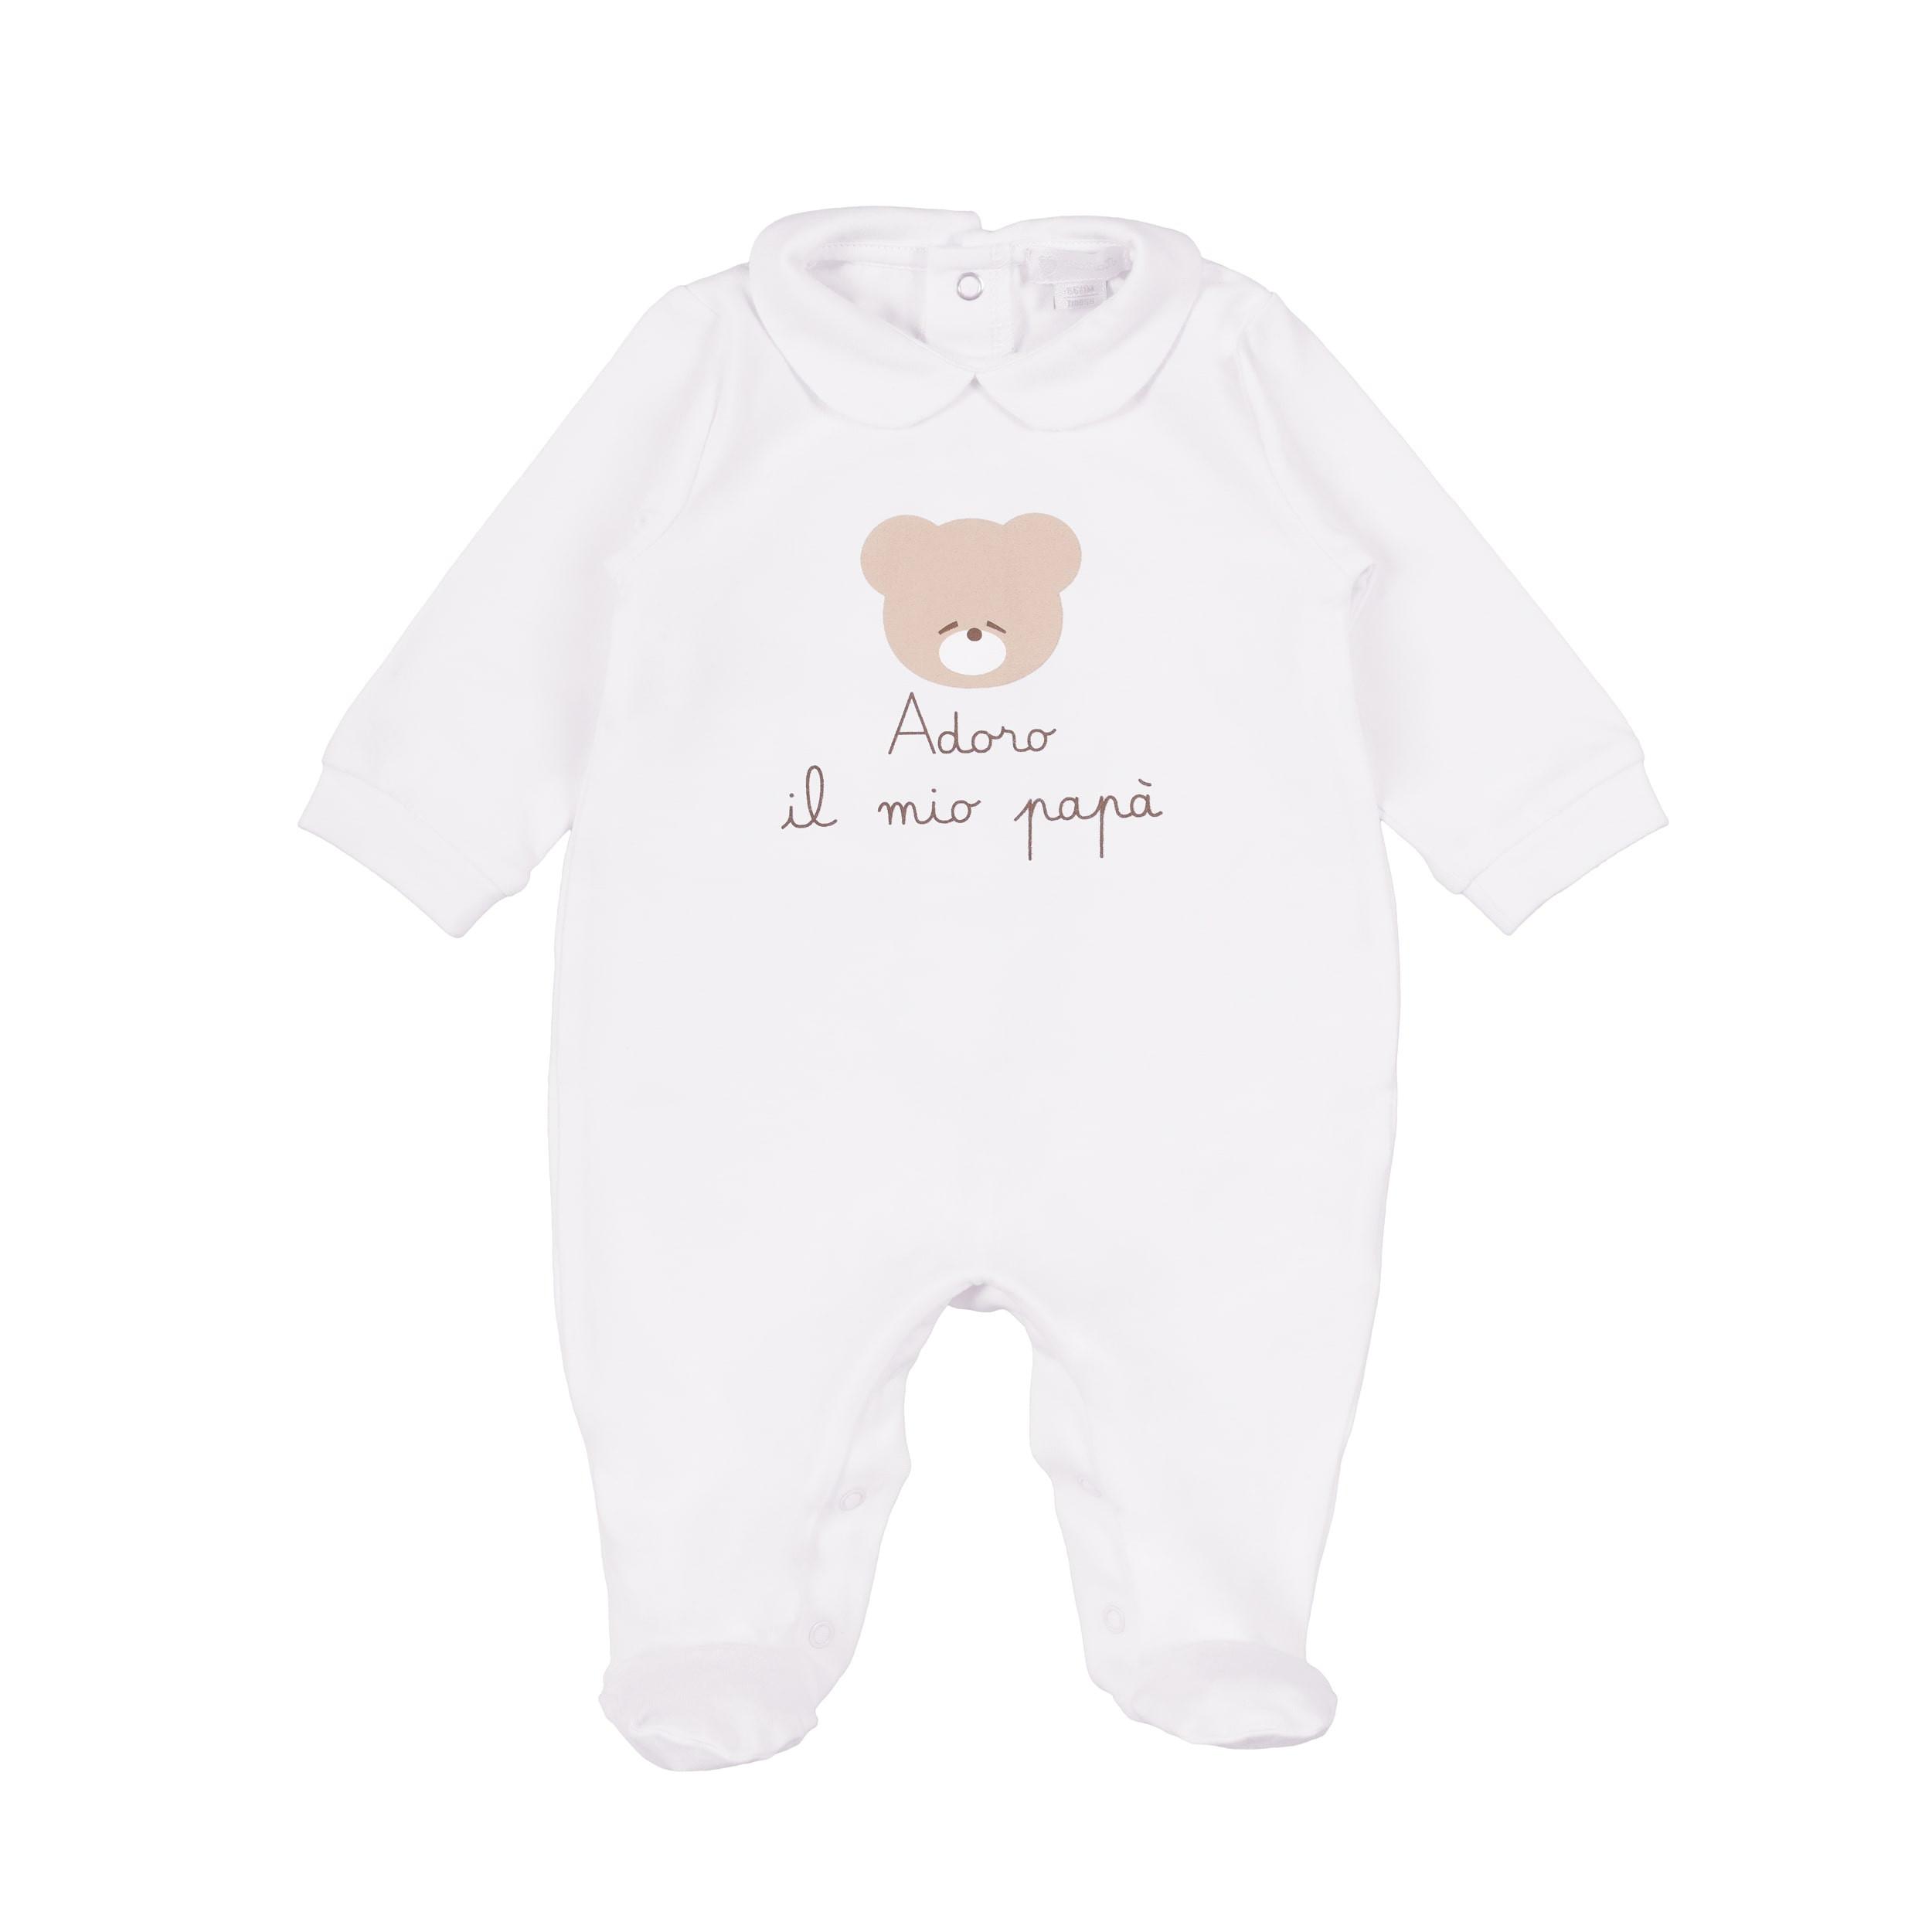 Pyjama - Adoro il mio papà 1 Mois